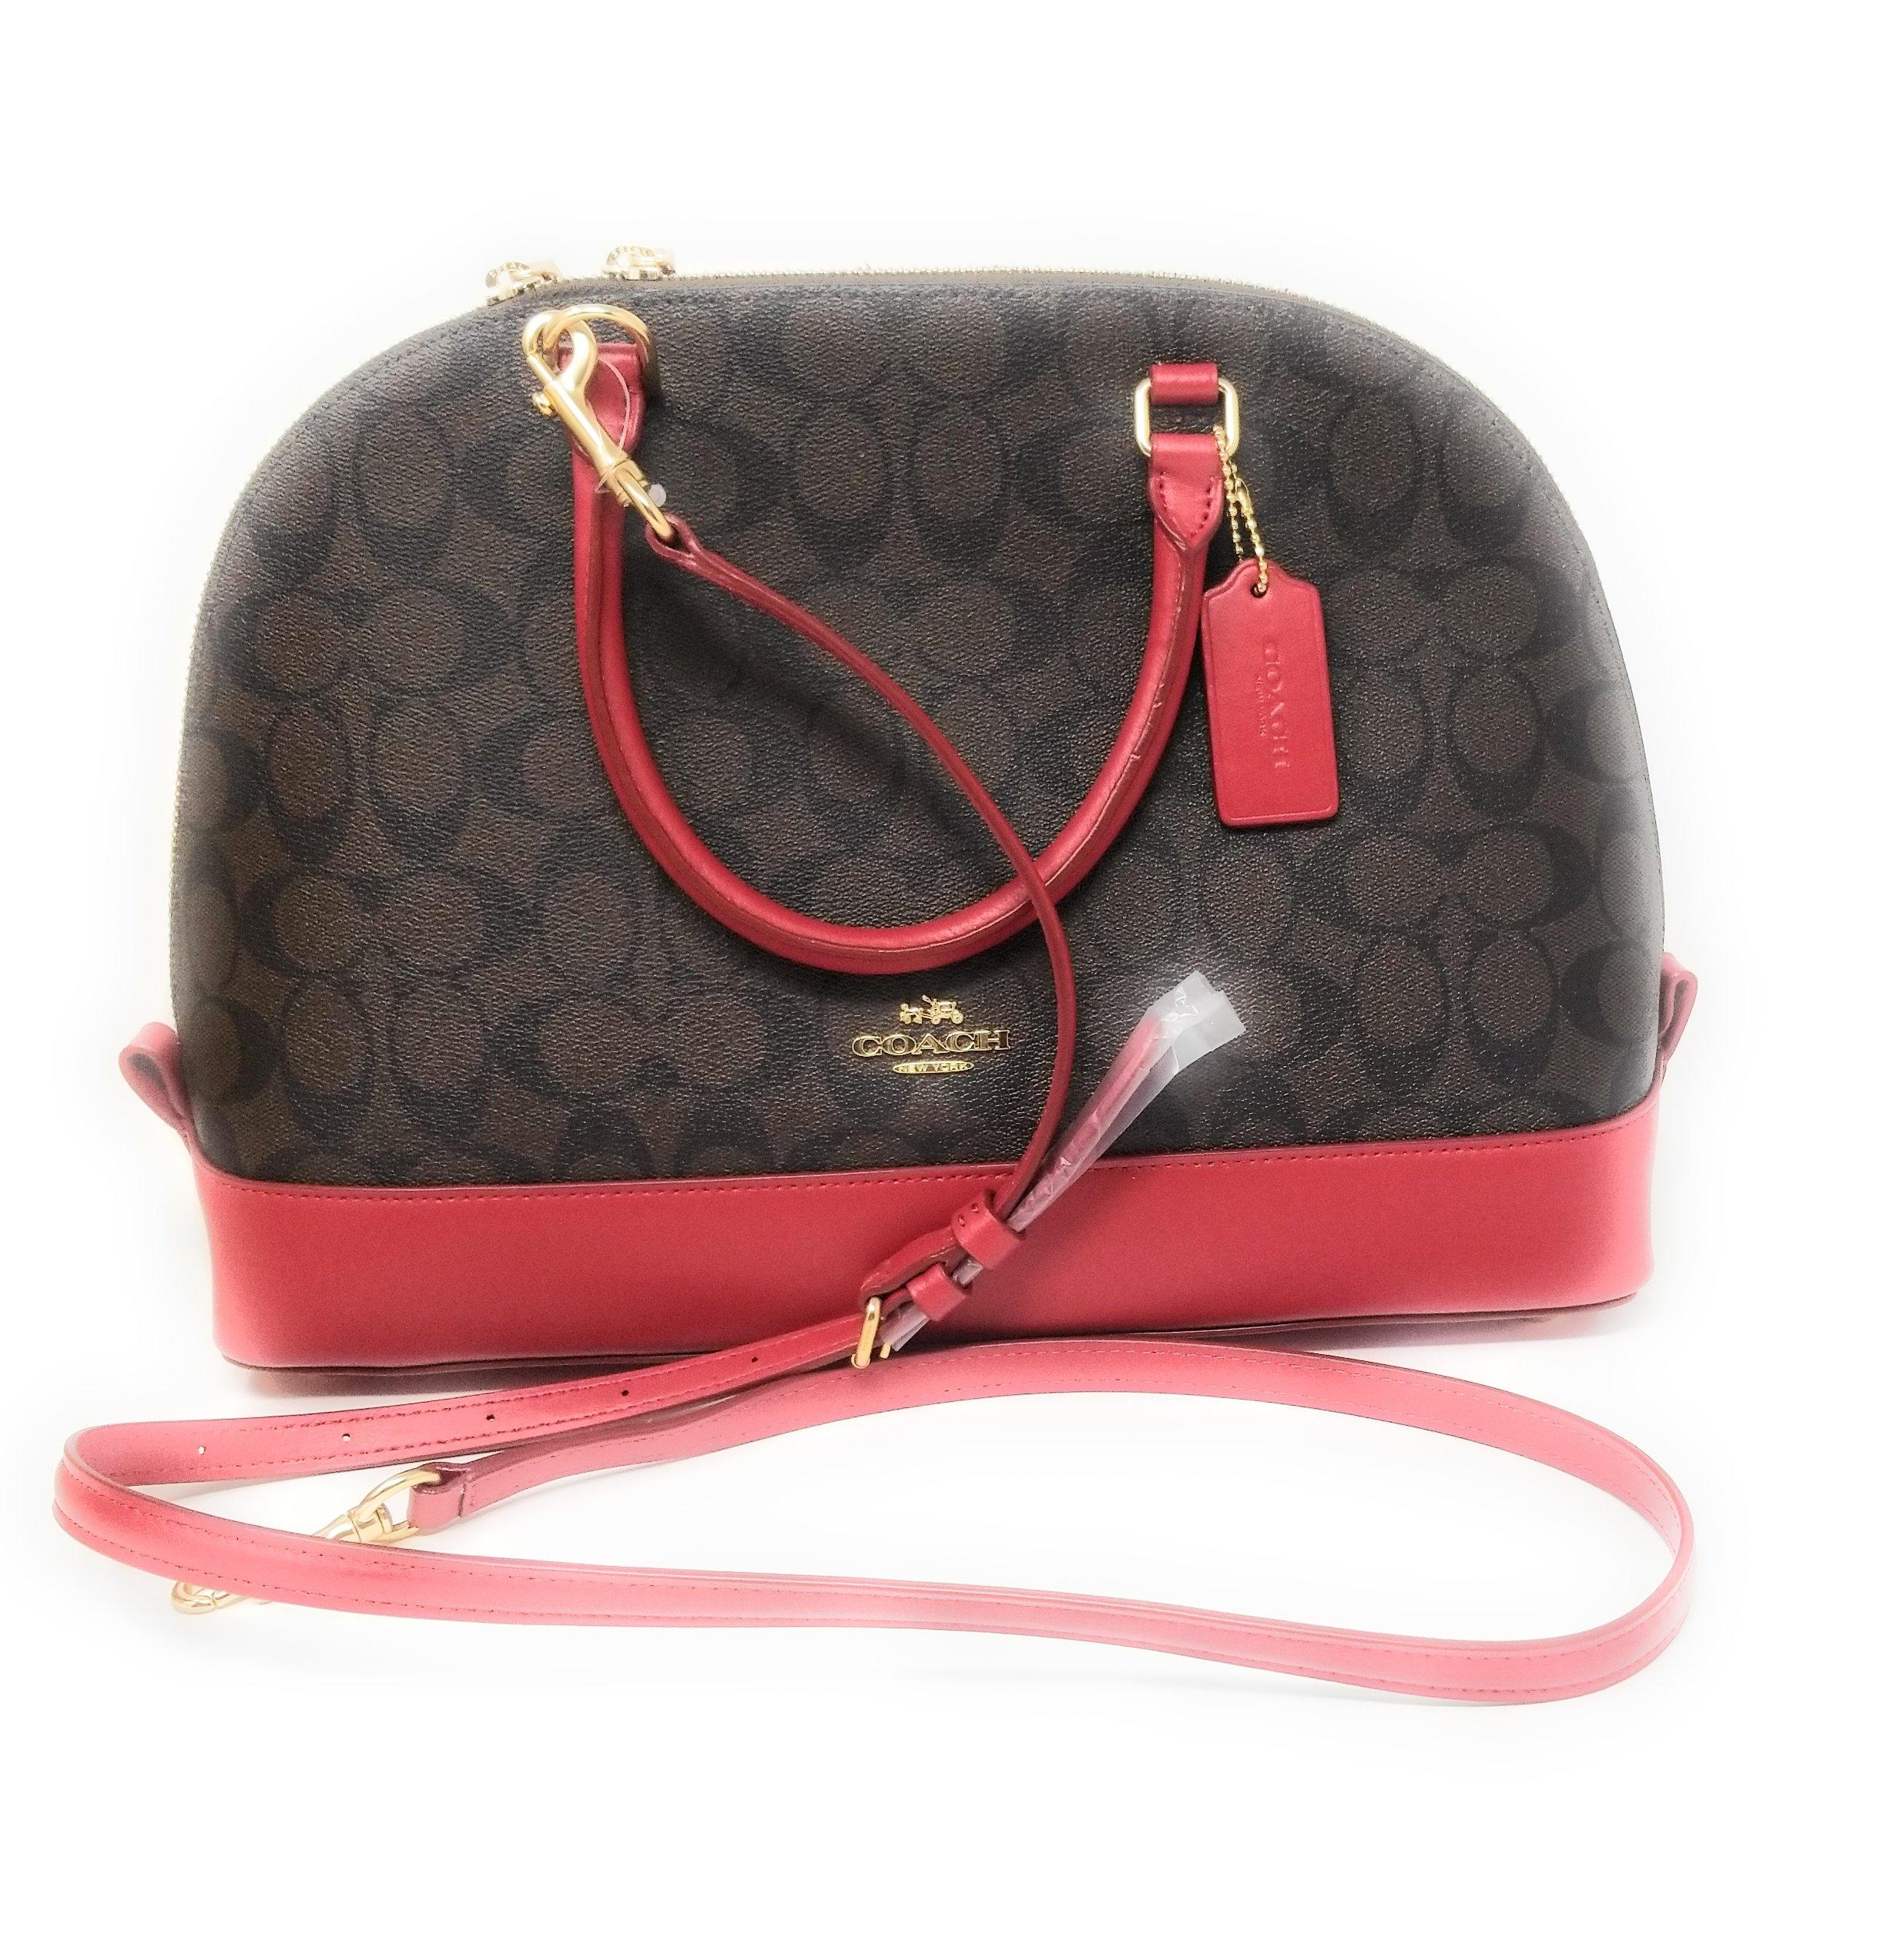 Coach Signature Sierra Satchel Crossbody Bag Purse Handbag (Brown /True Red)